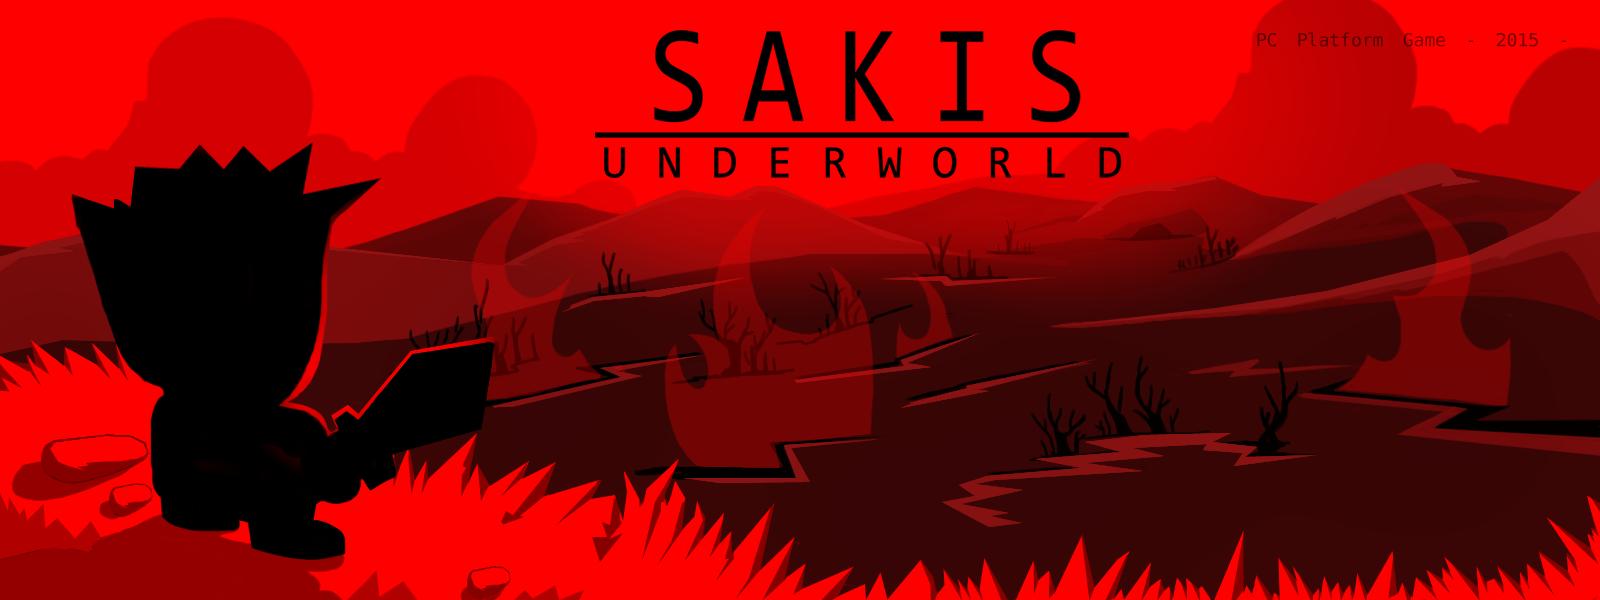 SAKIS - Underworld